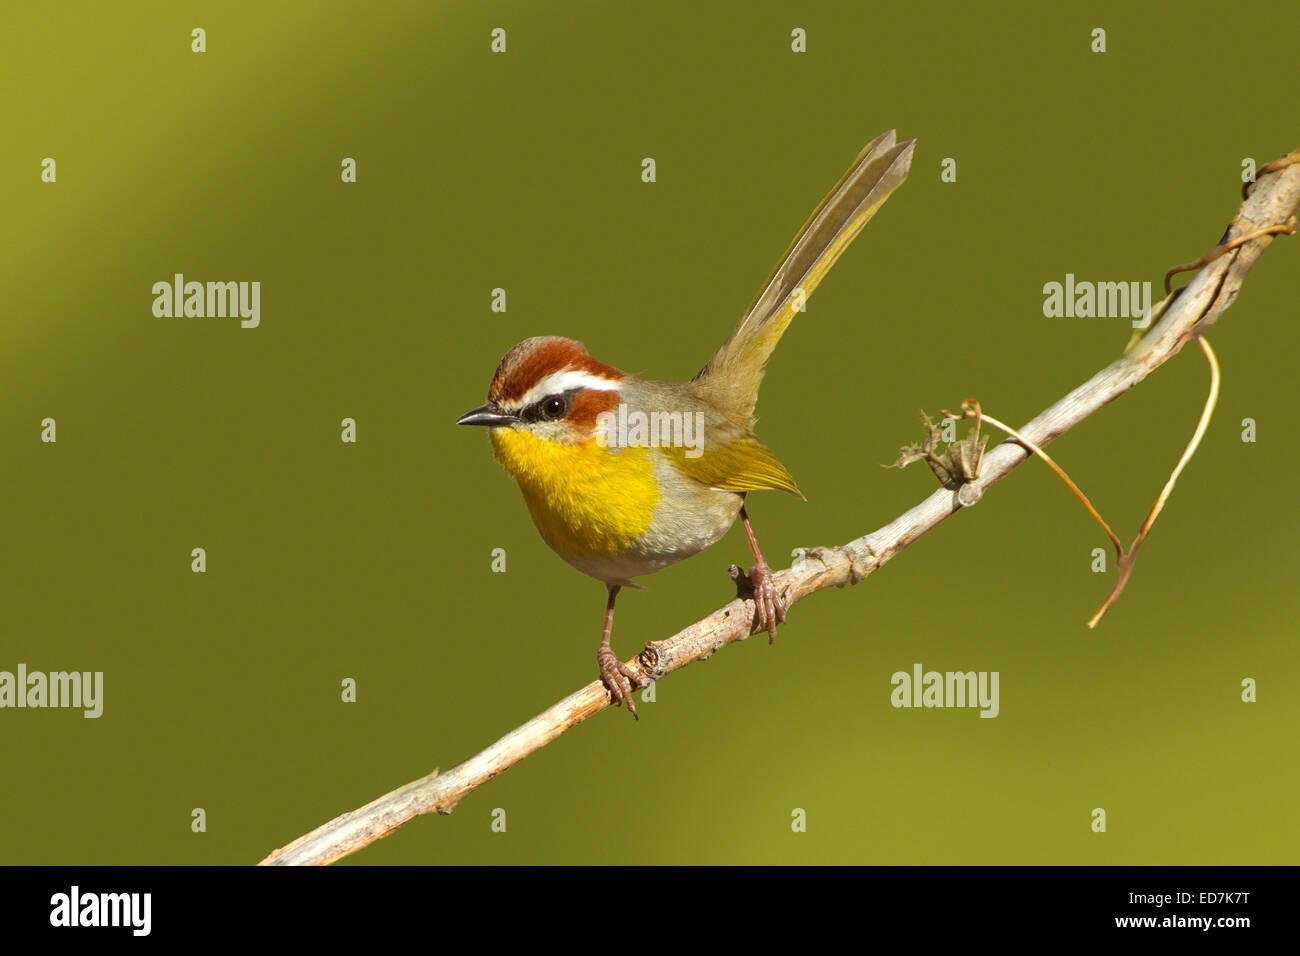 Rufous-capped Warbler  Basileuterus rufifrons Santa Rita Mountains, Pima County, Arizona, United States 30 December - Stock Image